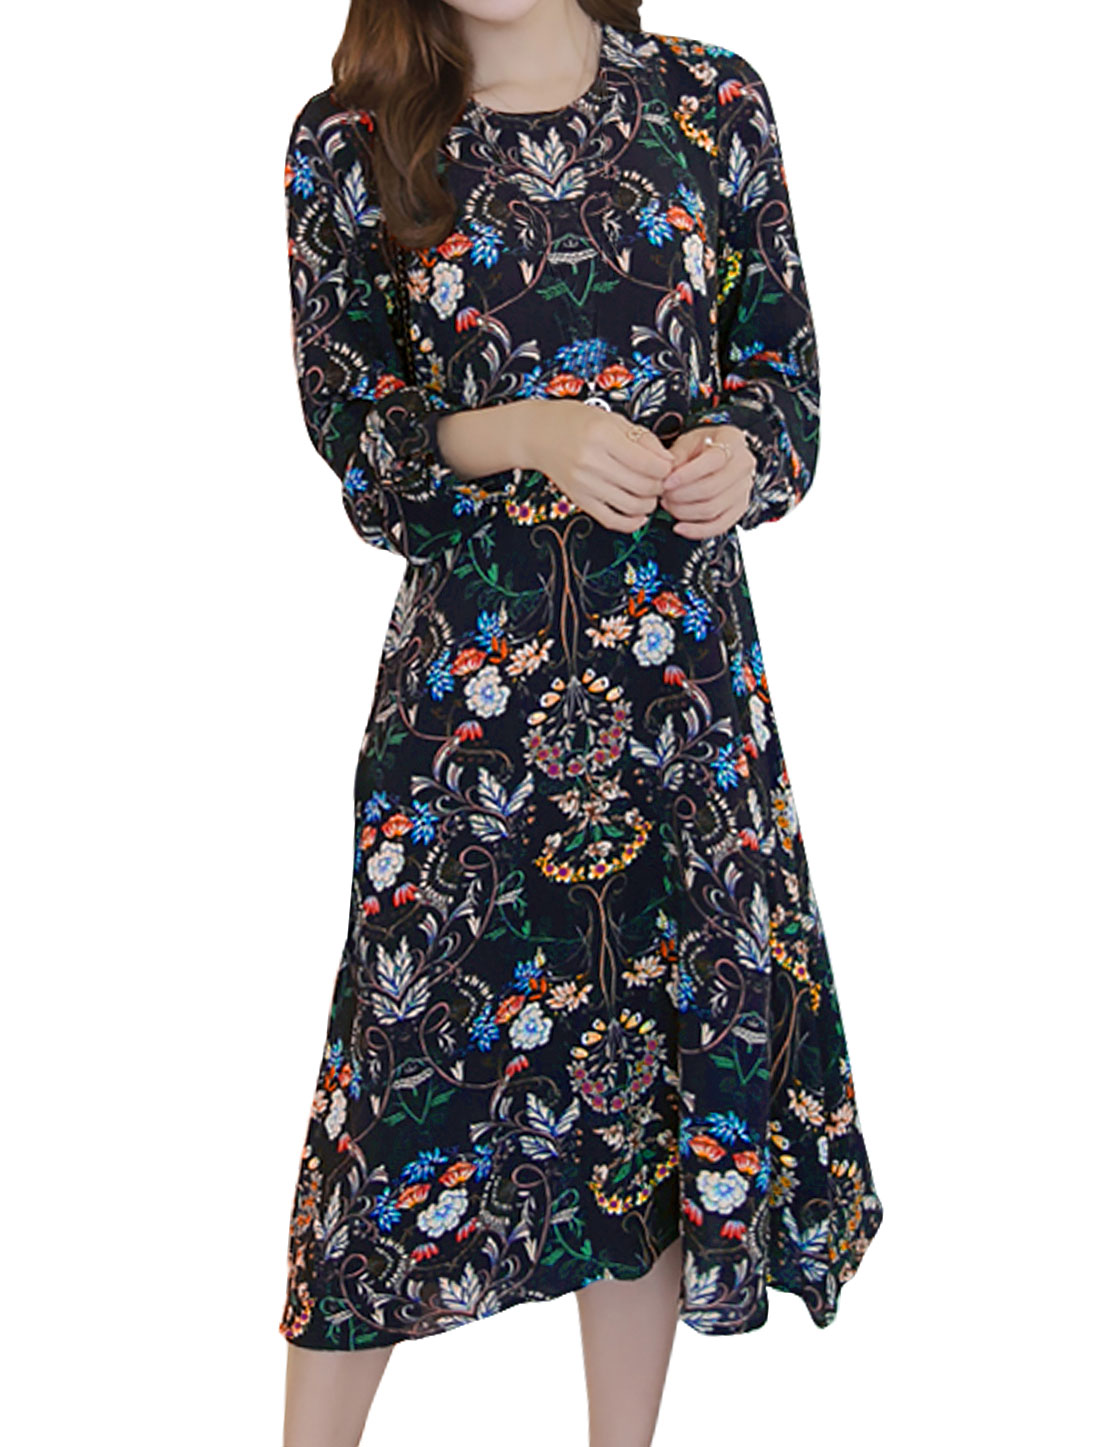 Women Long Sleeves Keyhole Back Floral Midi Dress Black S